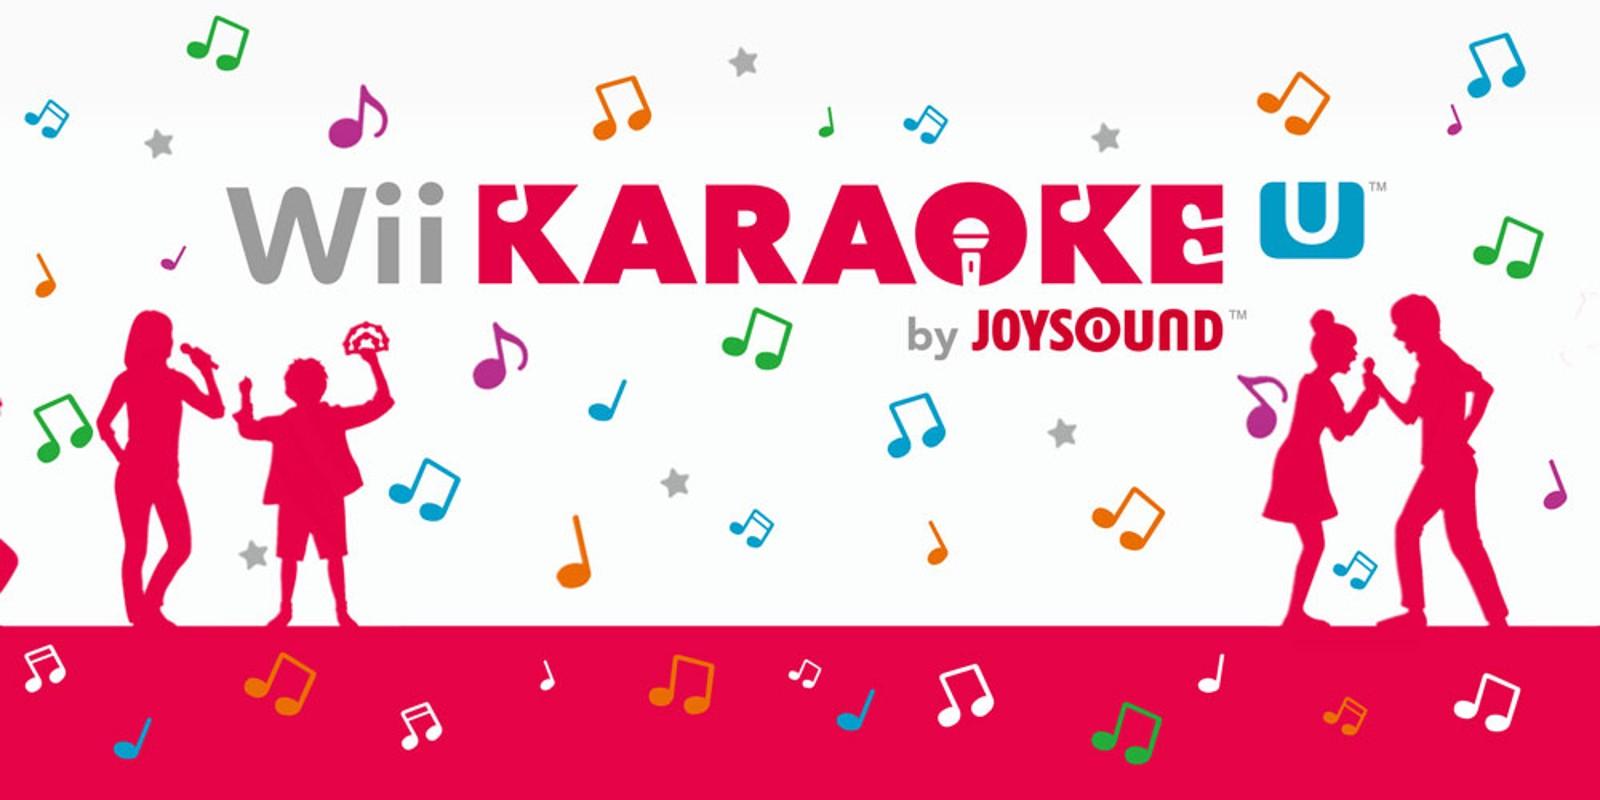 Wii Karaoke U by JOYSOUND | Wii U download software | Games | Nintendo